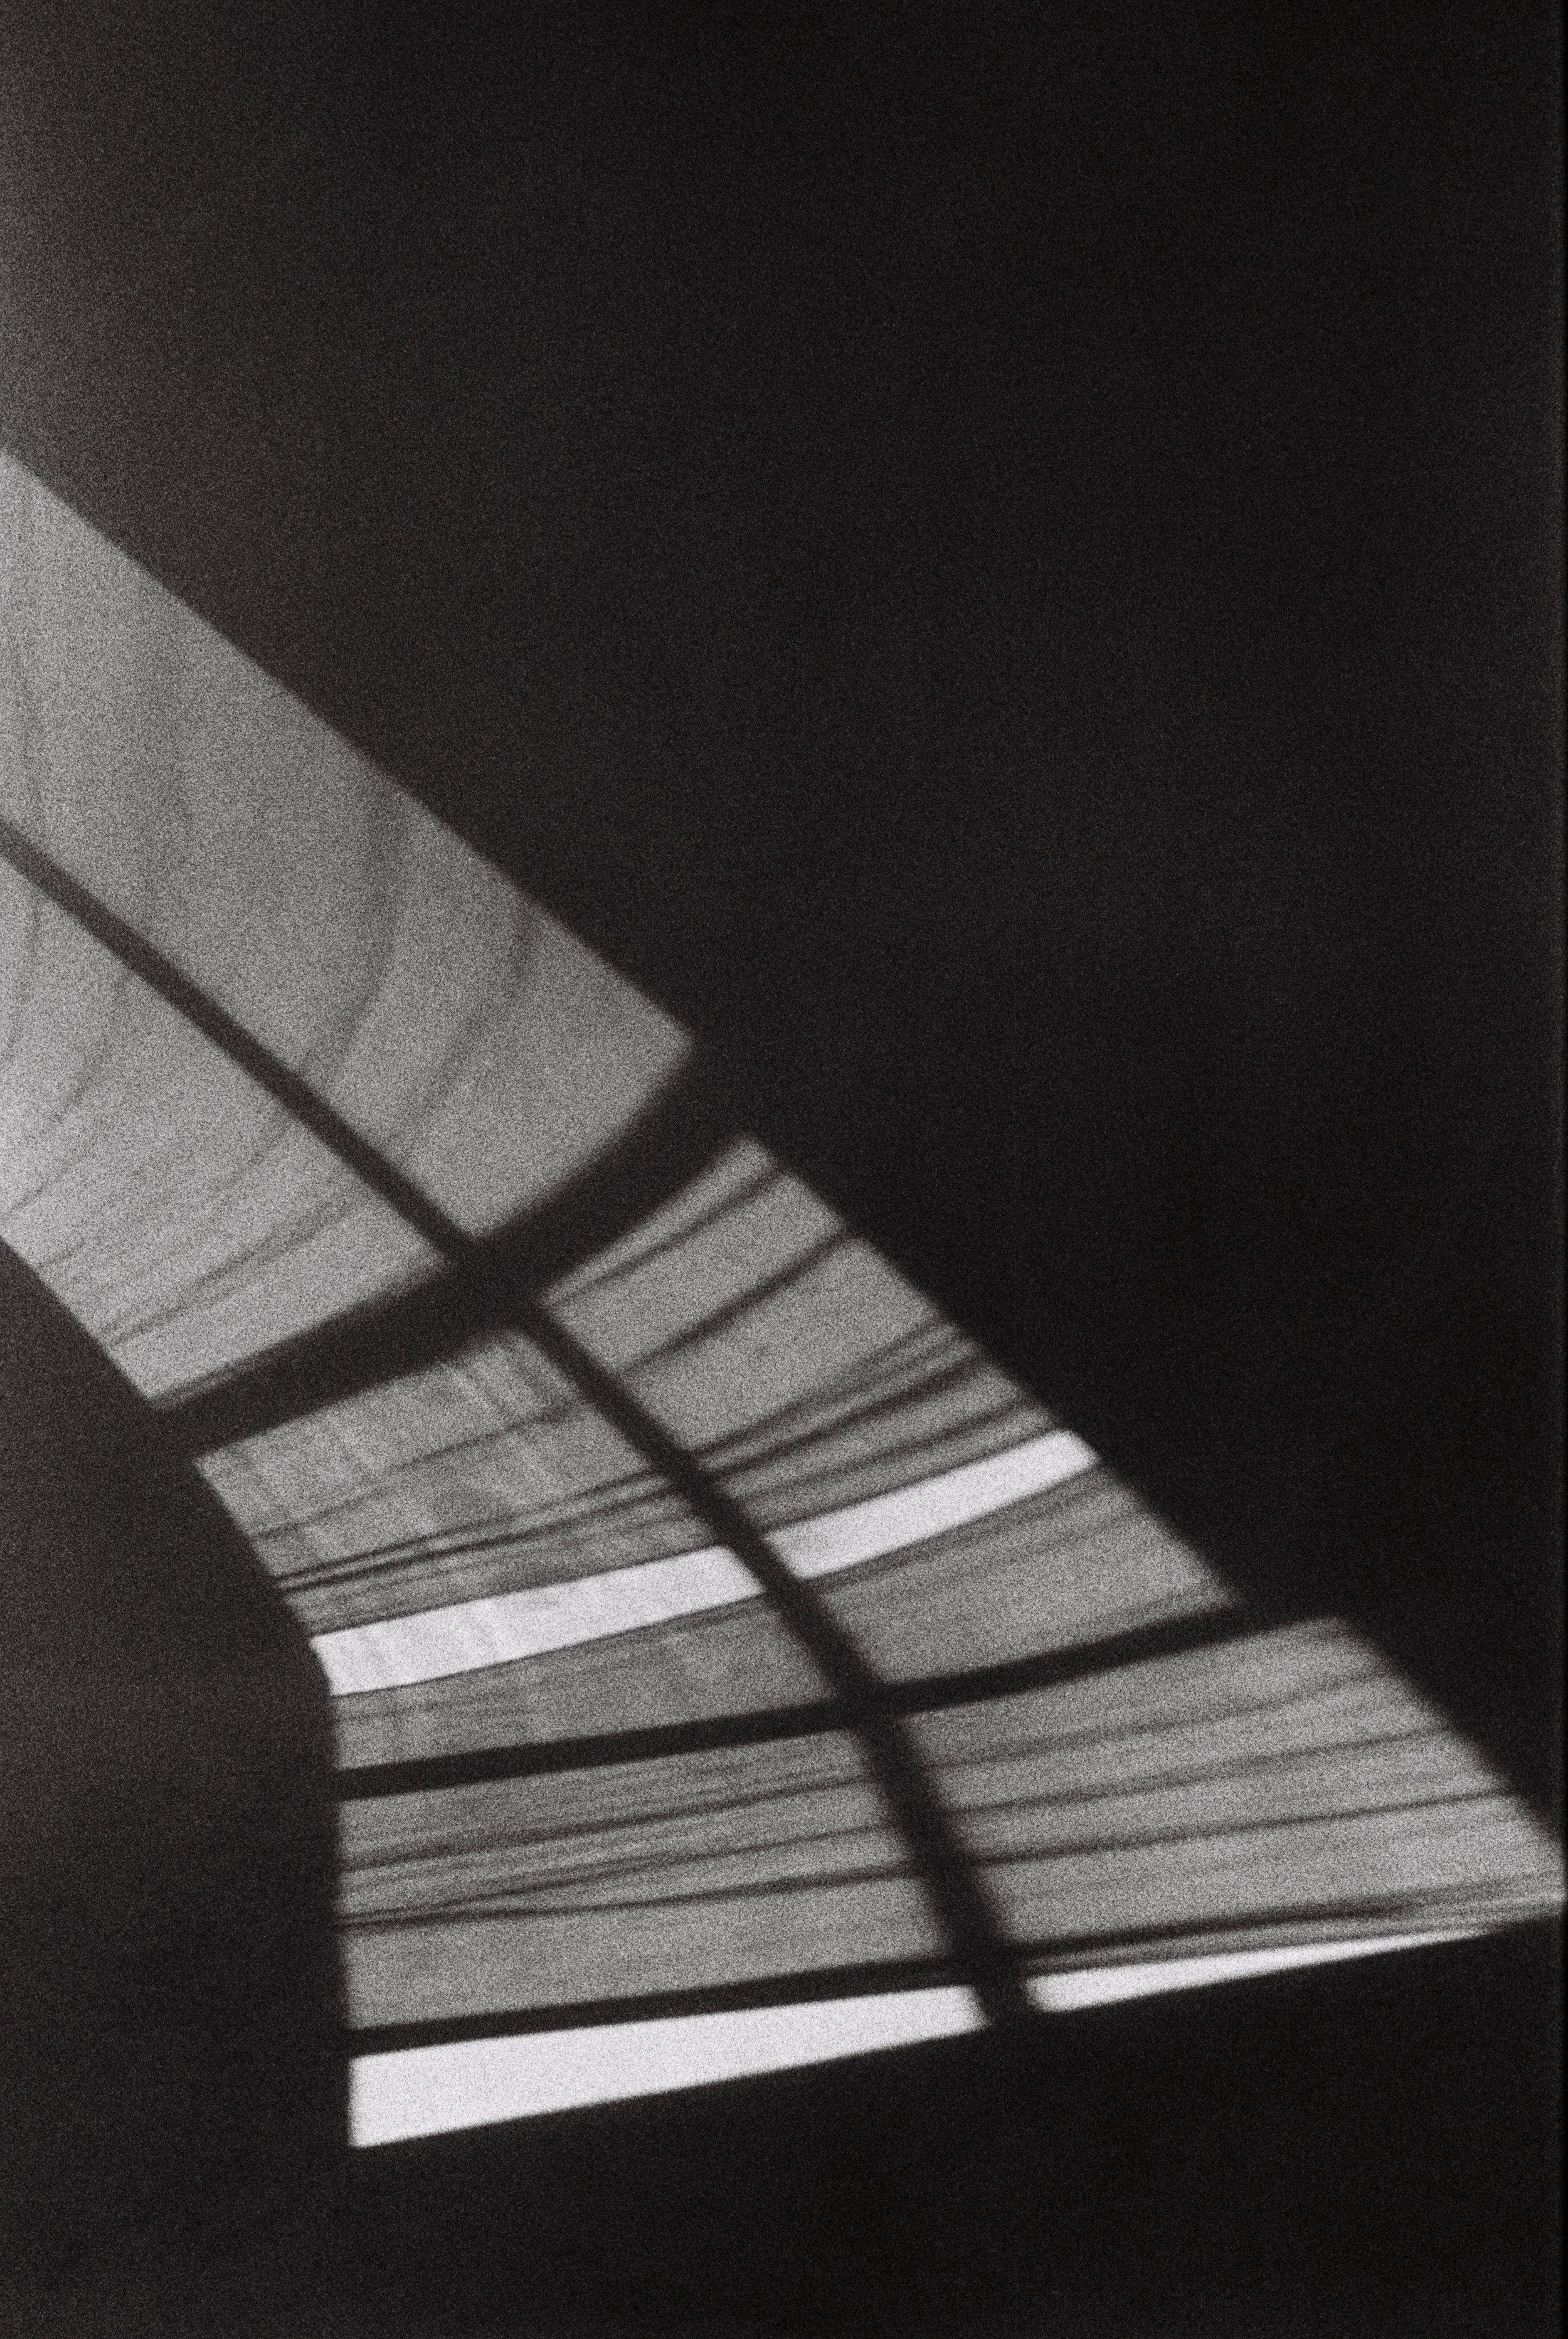 Boudoir Photographer Miami Portrait Photographer natural light studio Pam_denicelachapelle-97.jpg